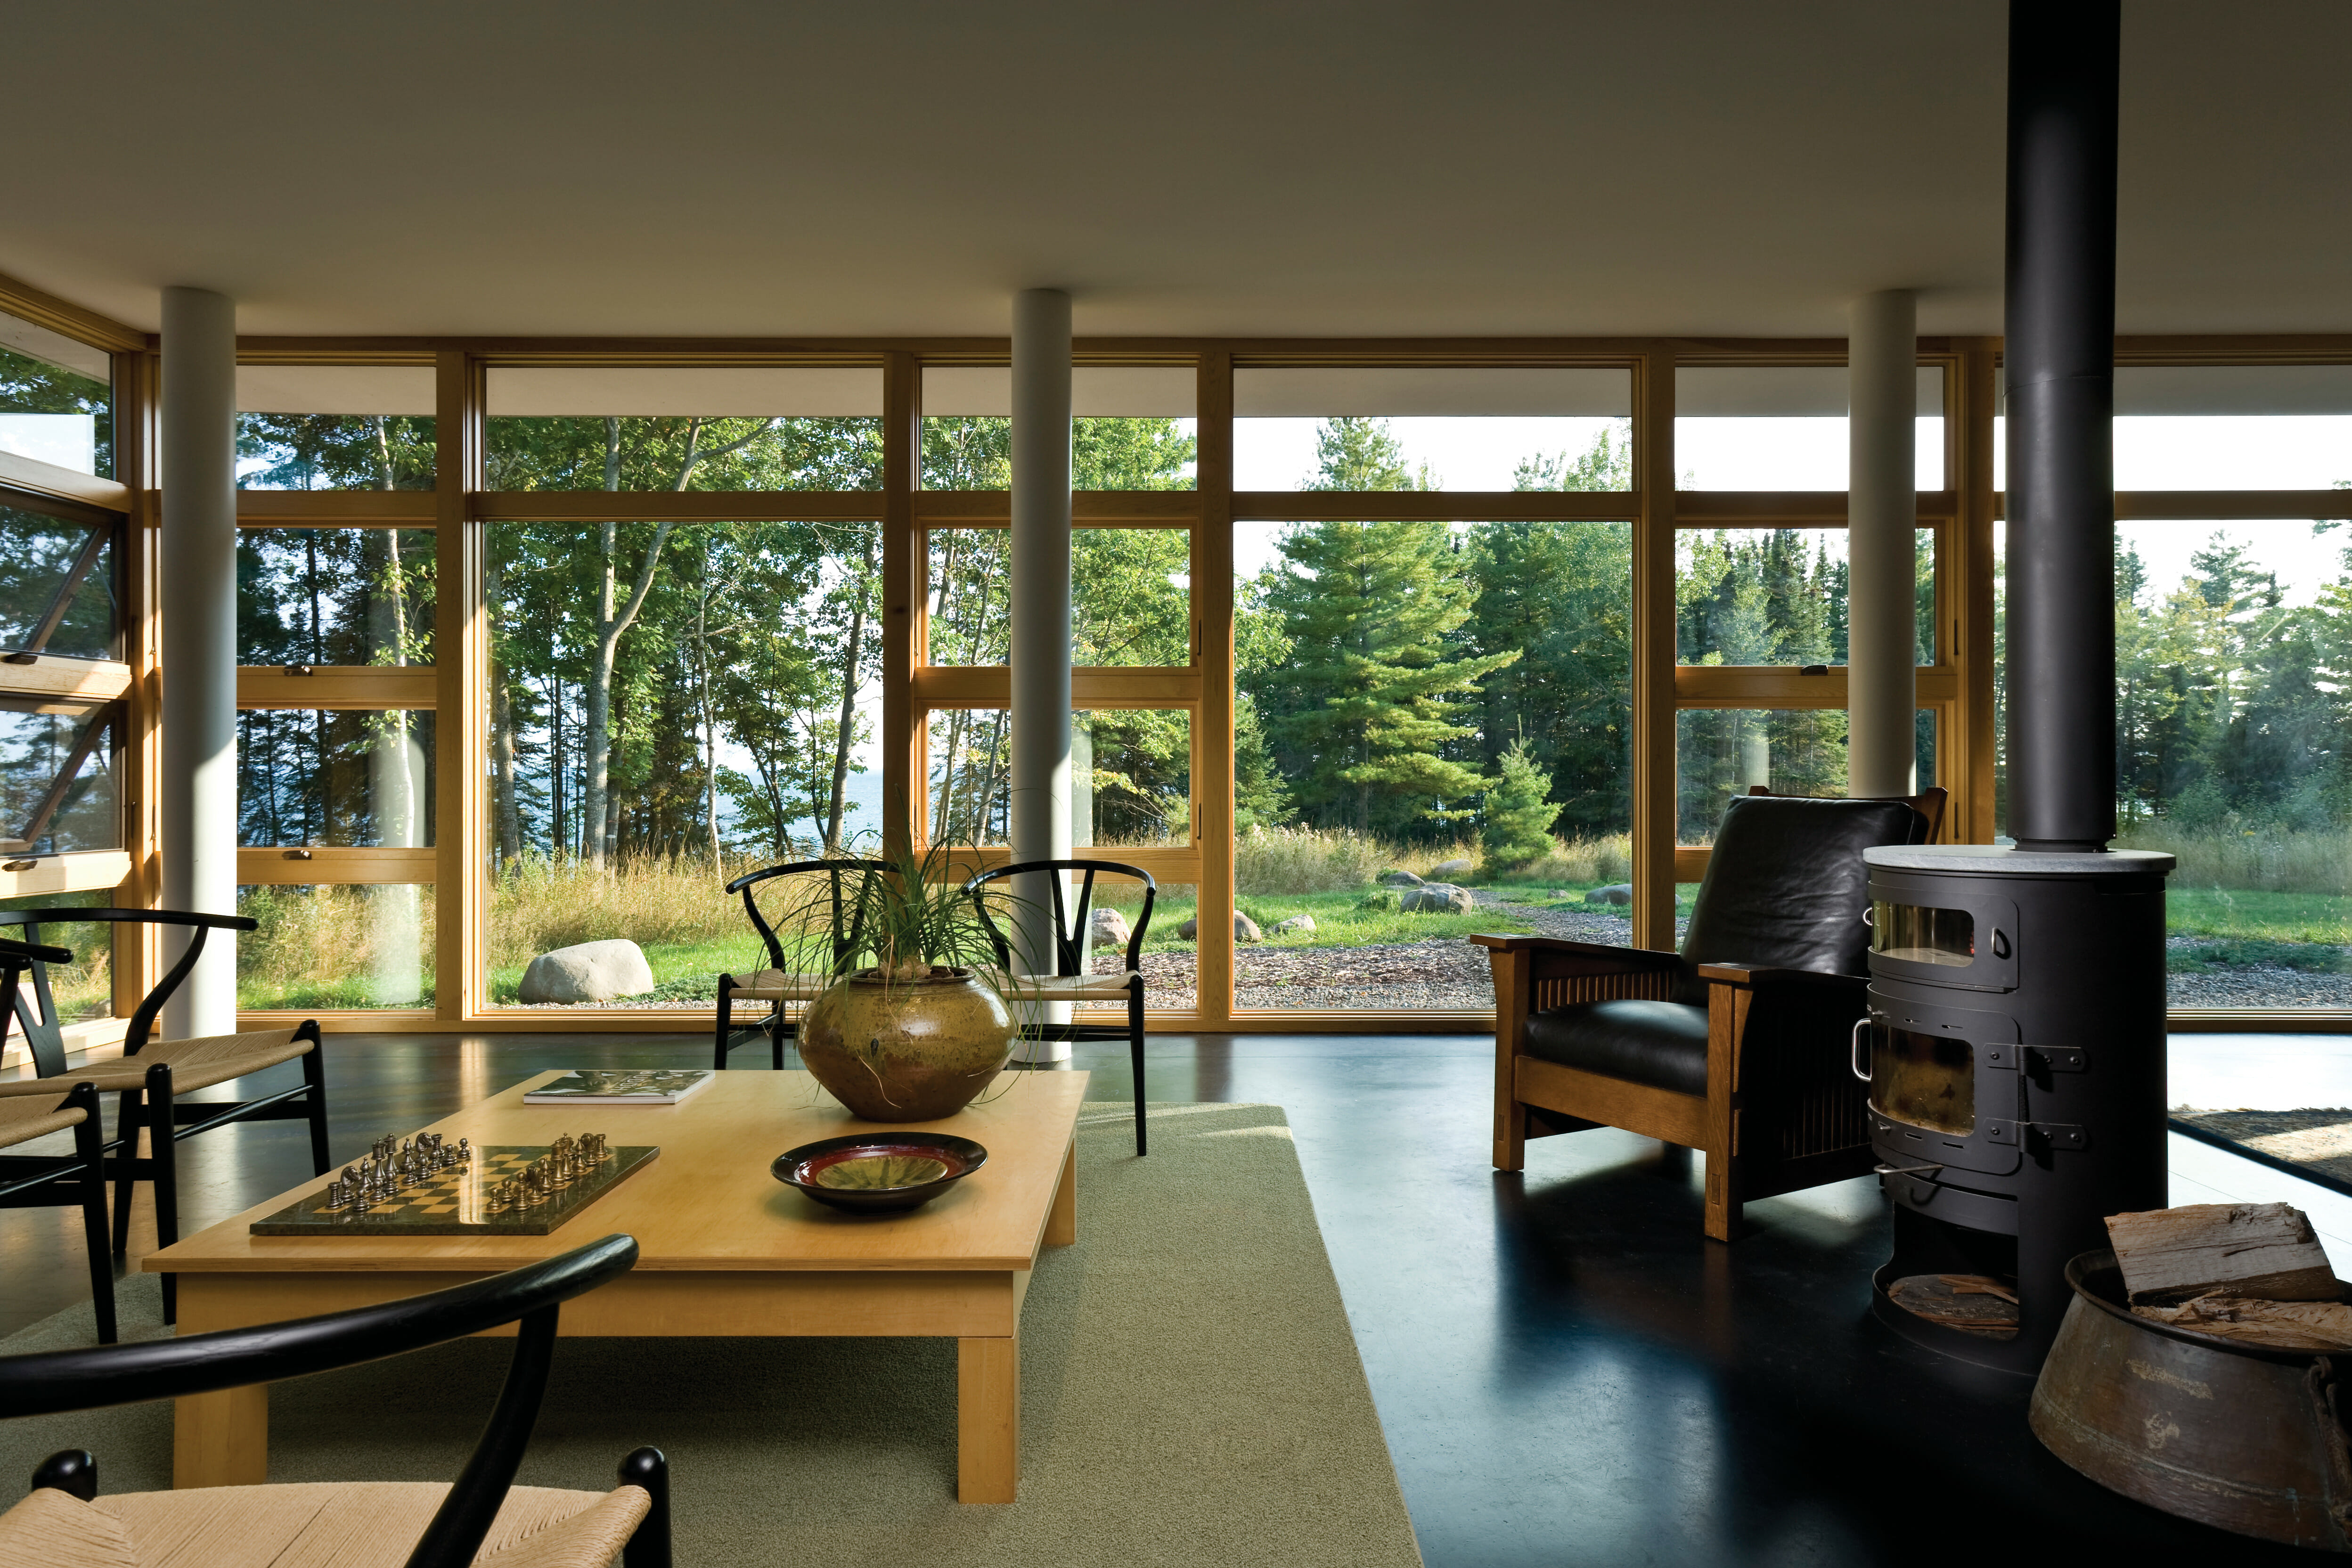 ScandinavianInspired Window Designs Modernize